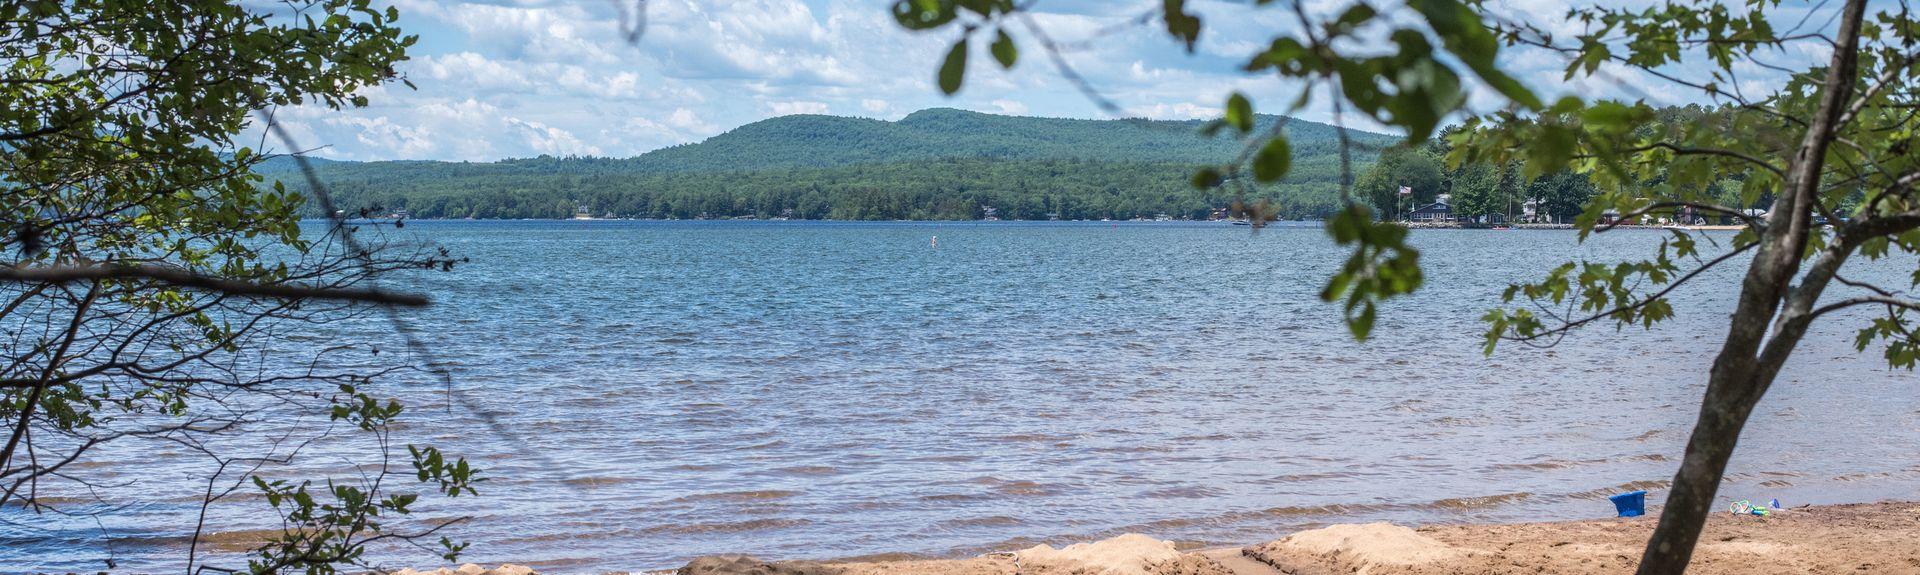 Sebago Lake, Maine, Estados Unidos